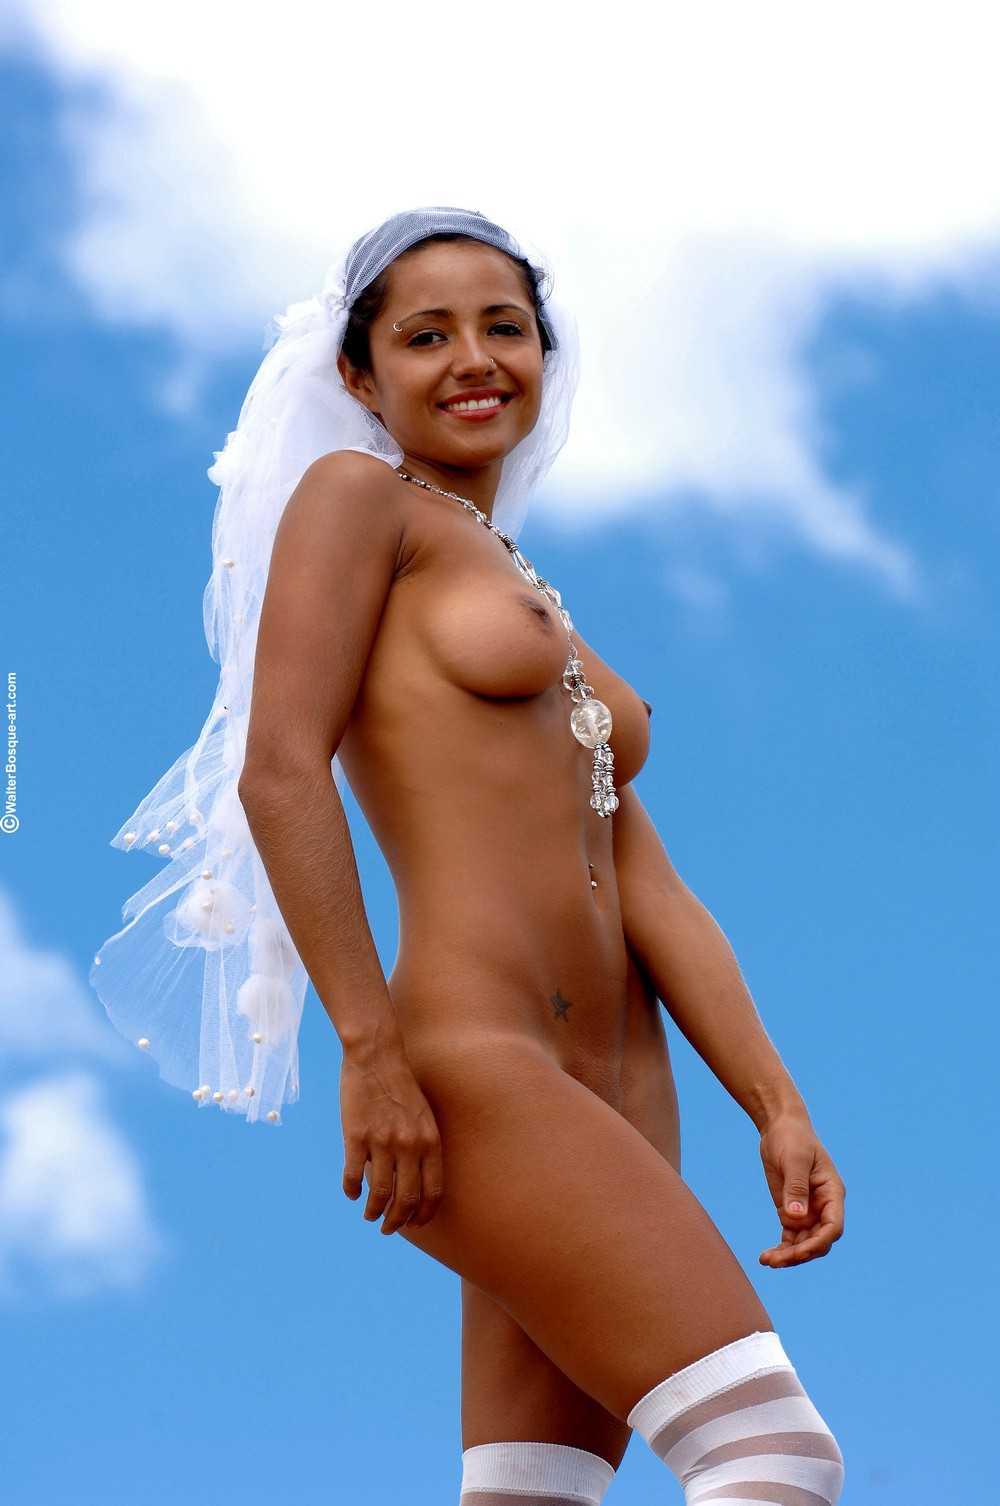 Обнаженная невеста Mia